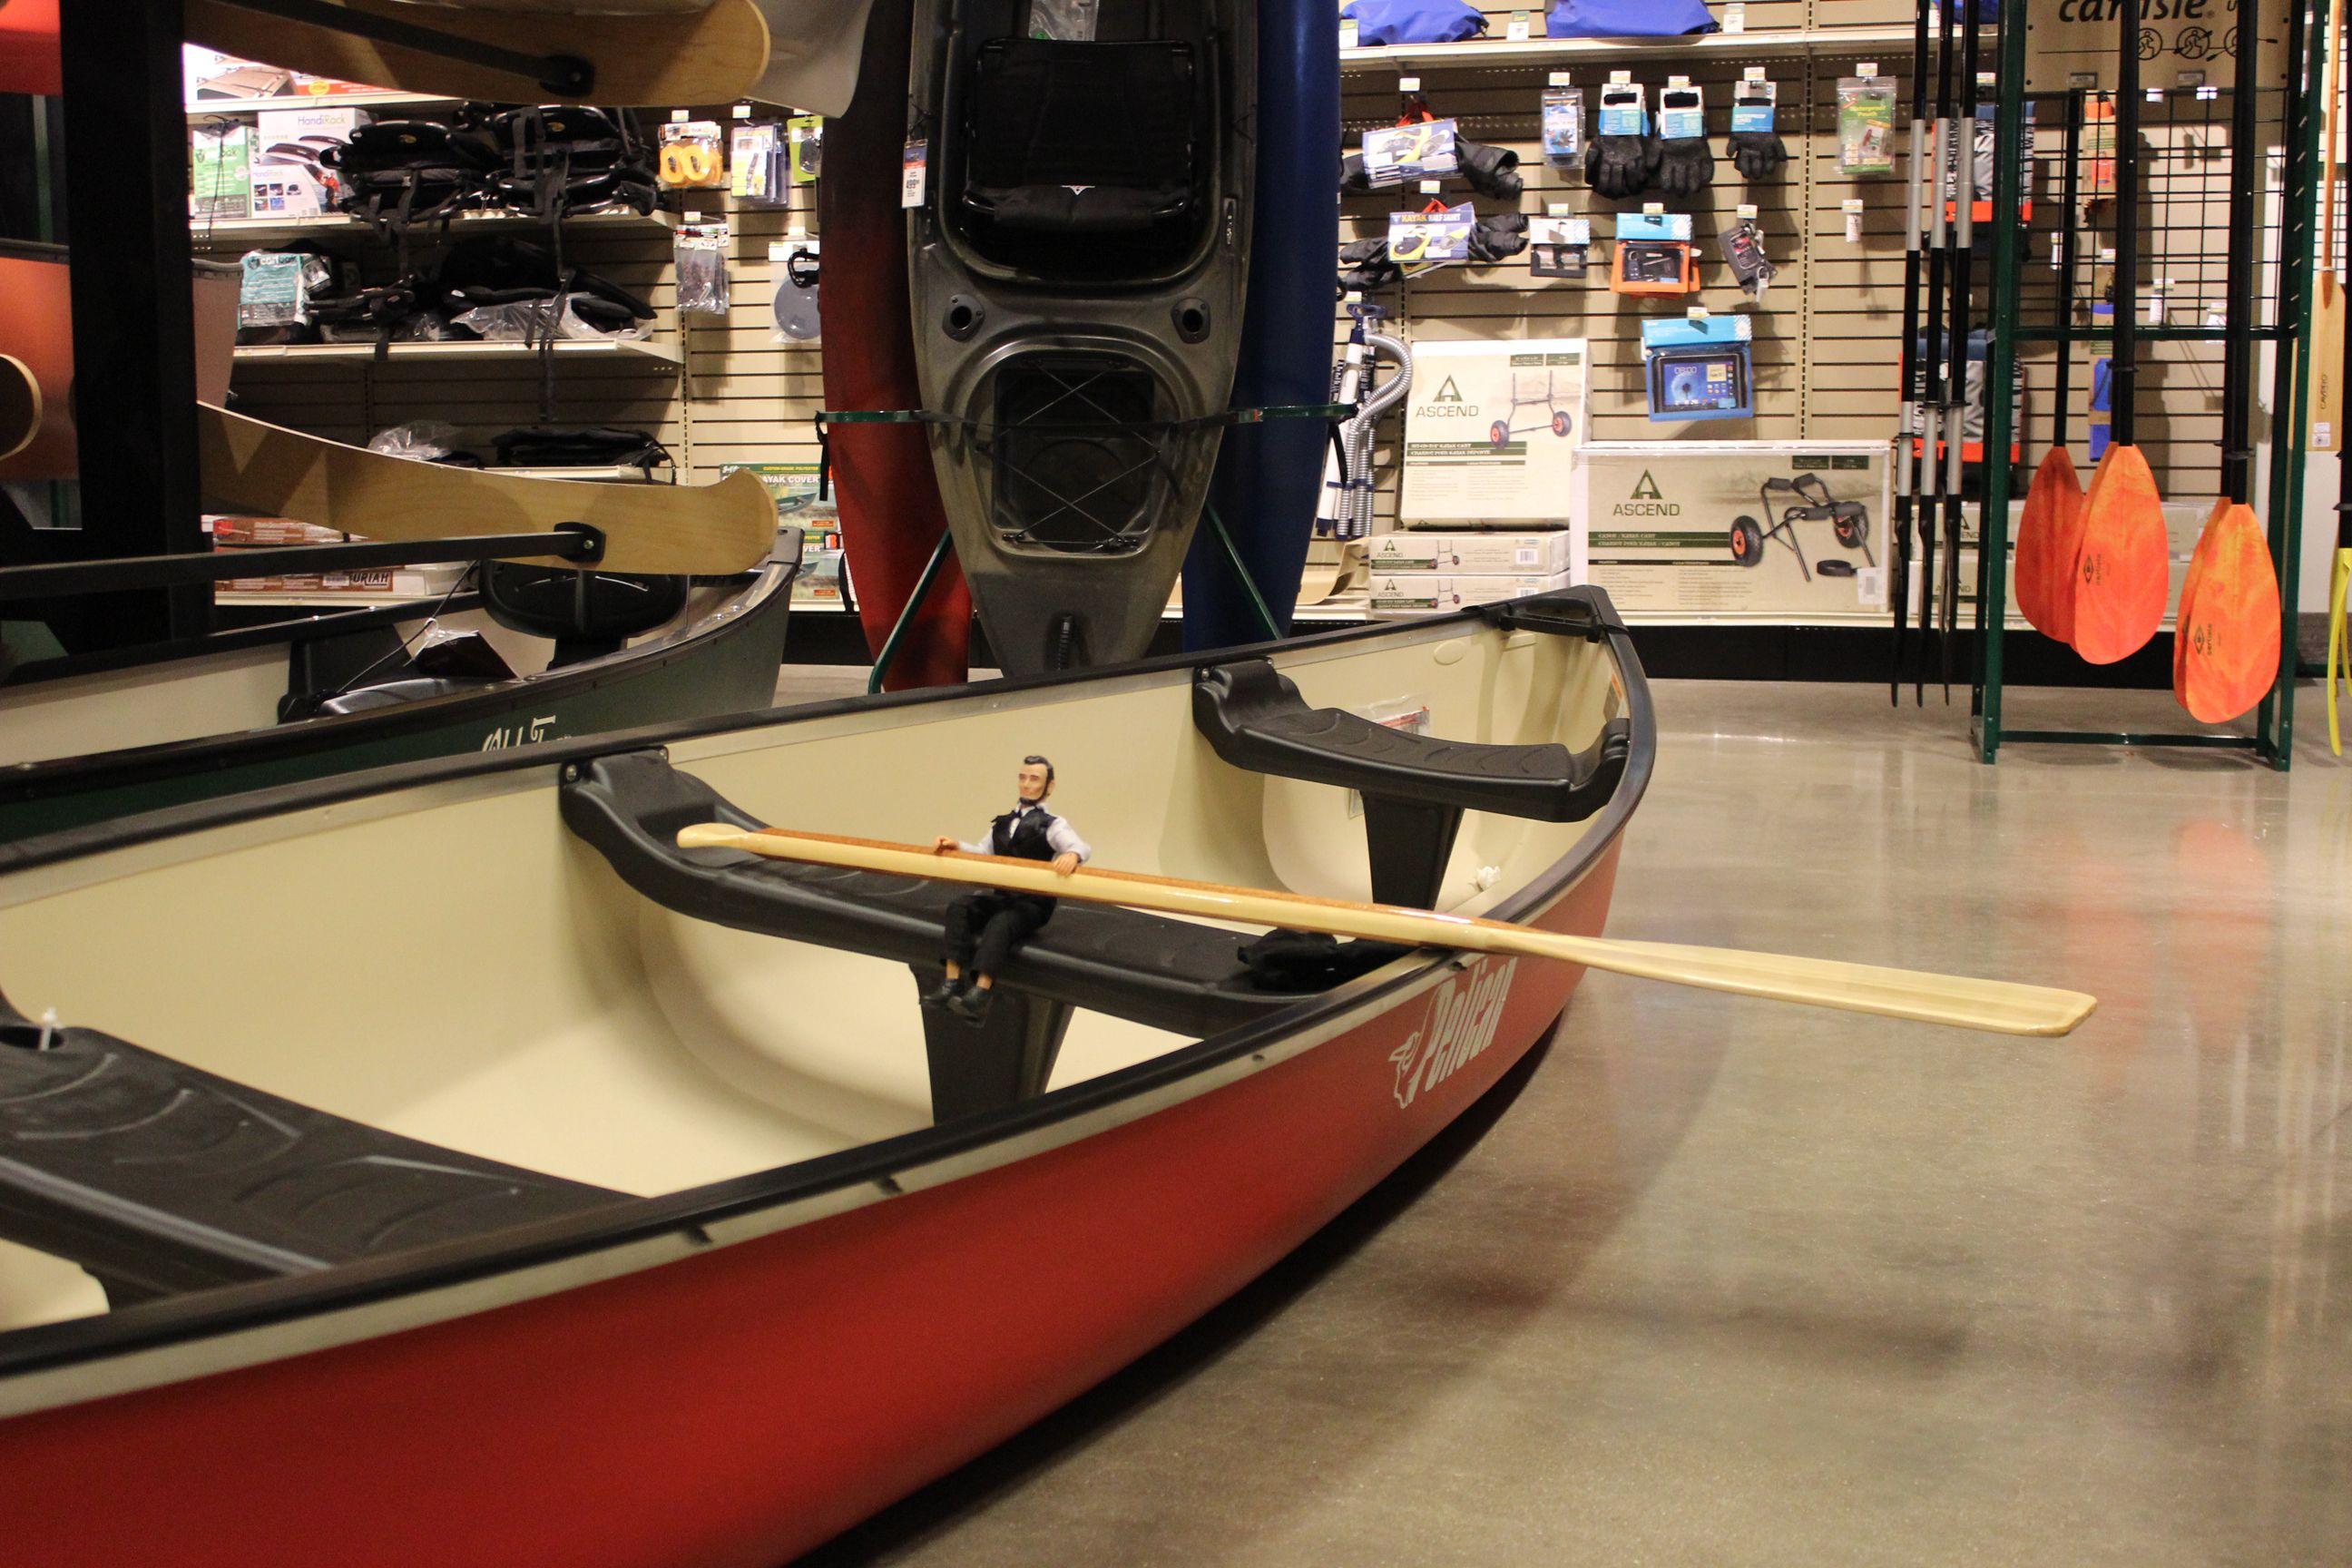 """I'll take it!"" - #MiniAbe - Bass Pro Shops - Bolingbrook, IL Enjoy Illinois"